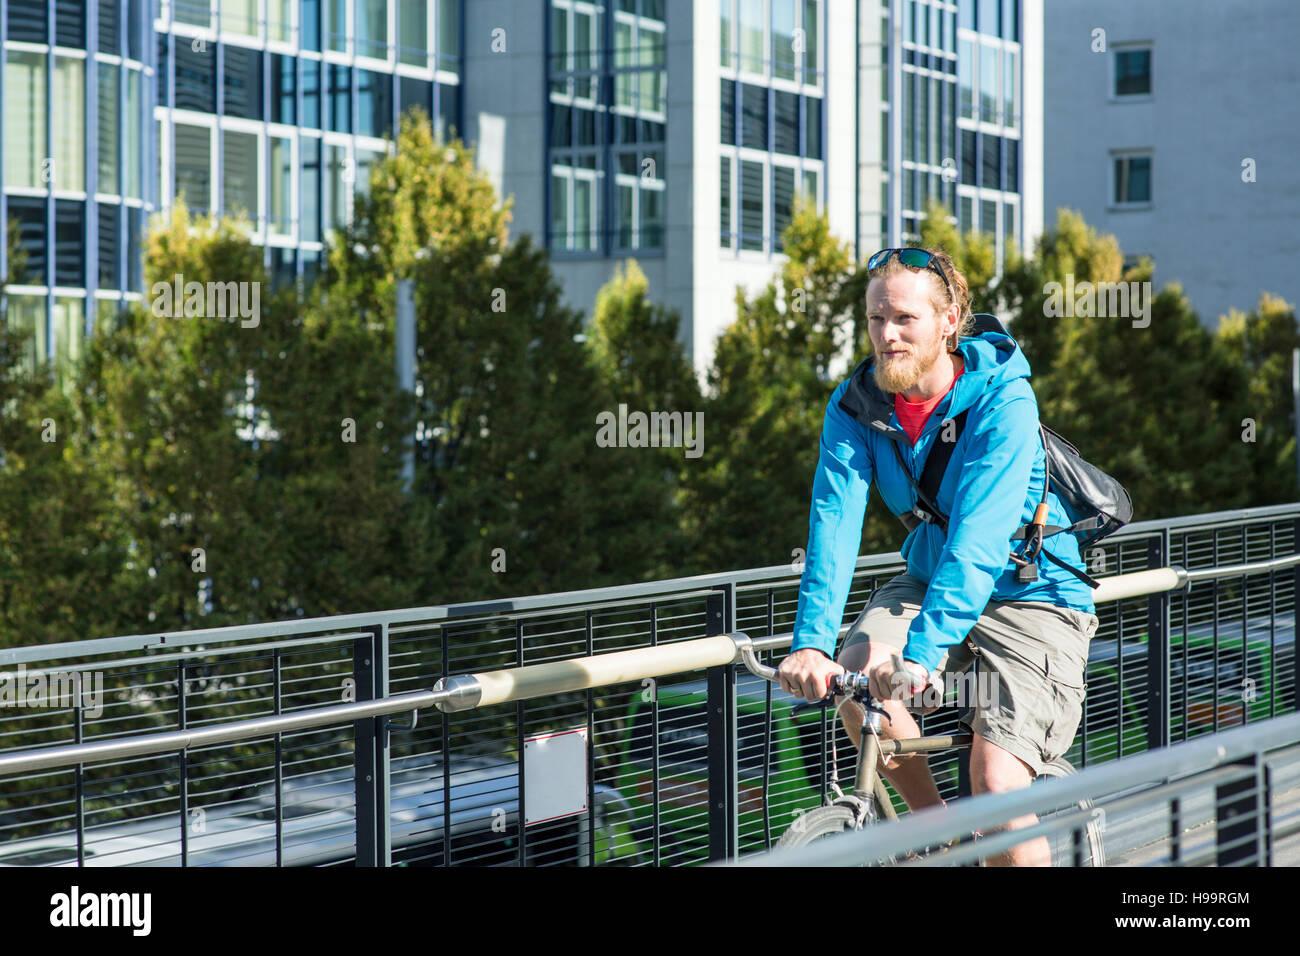 Bike messenger on the move - Stock Image